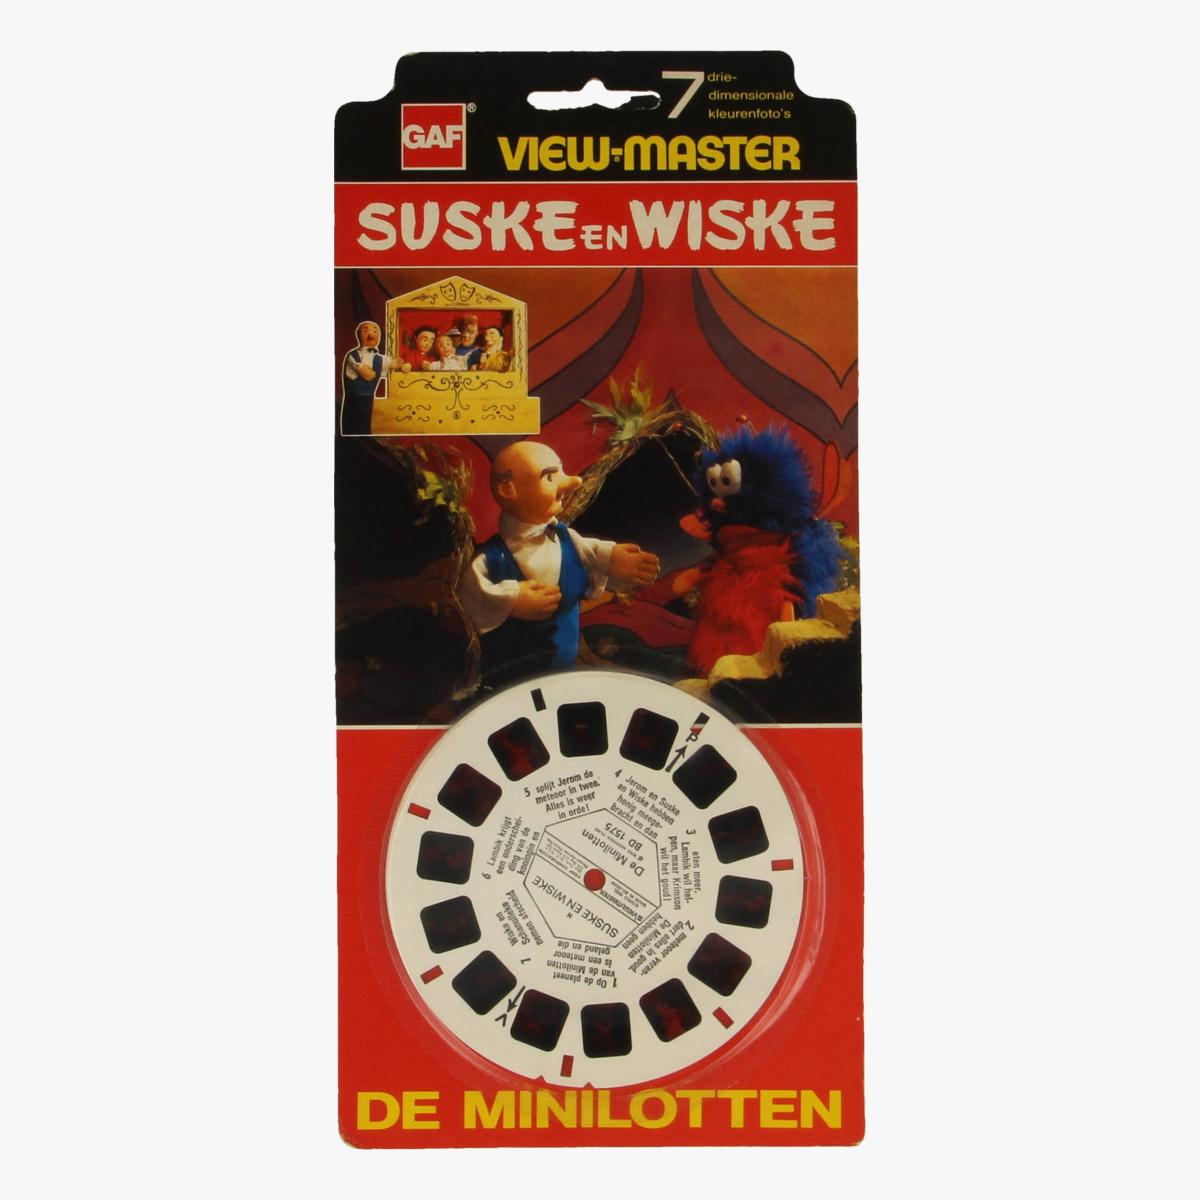 Afbeeldingen van View-master Suske en Wiske De minilotten